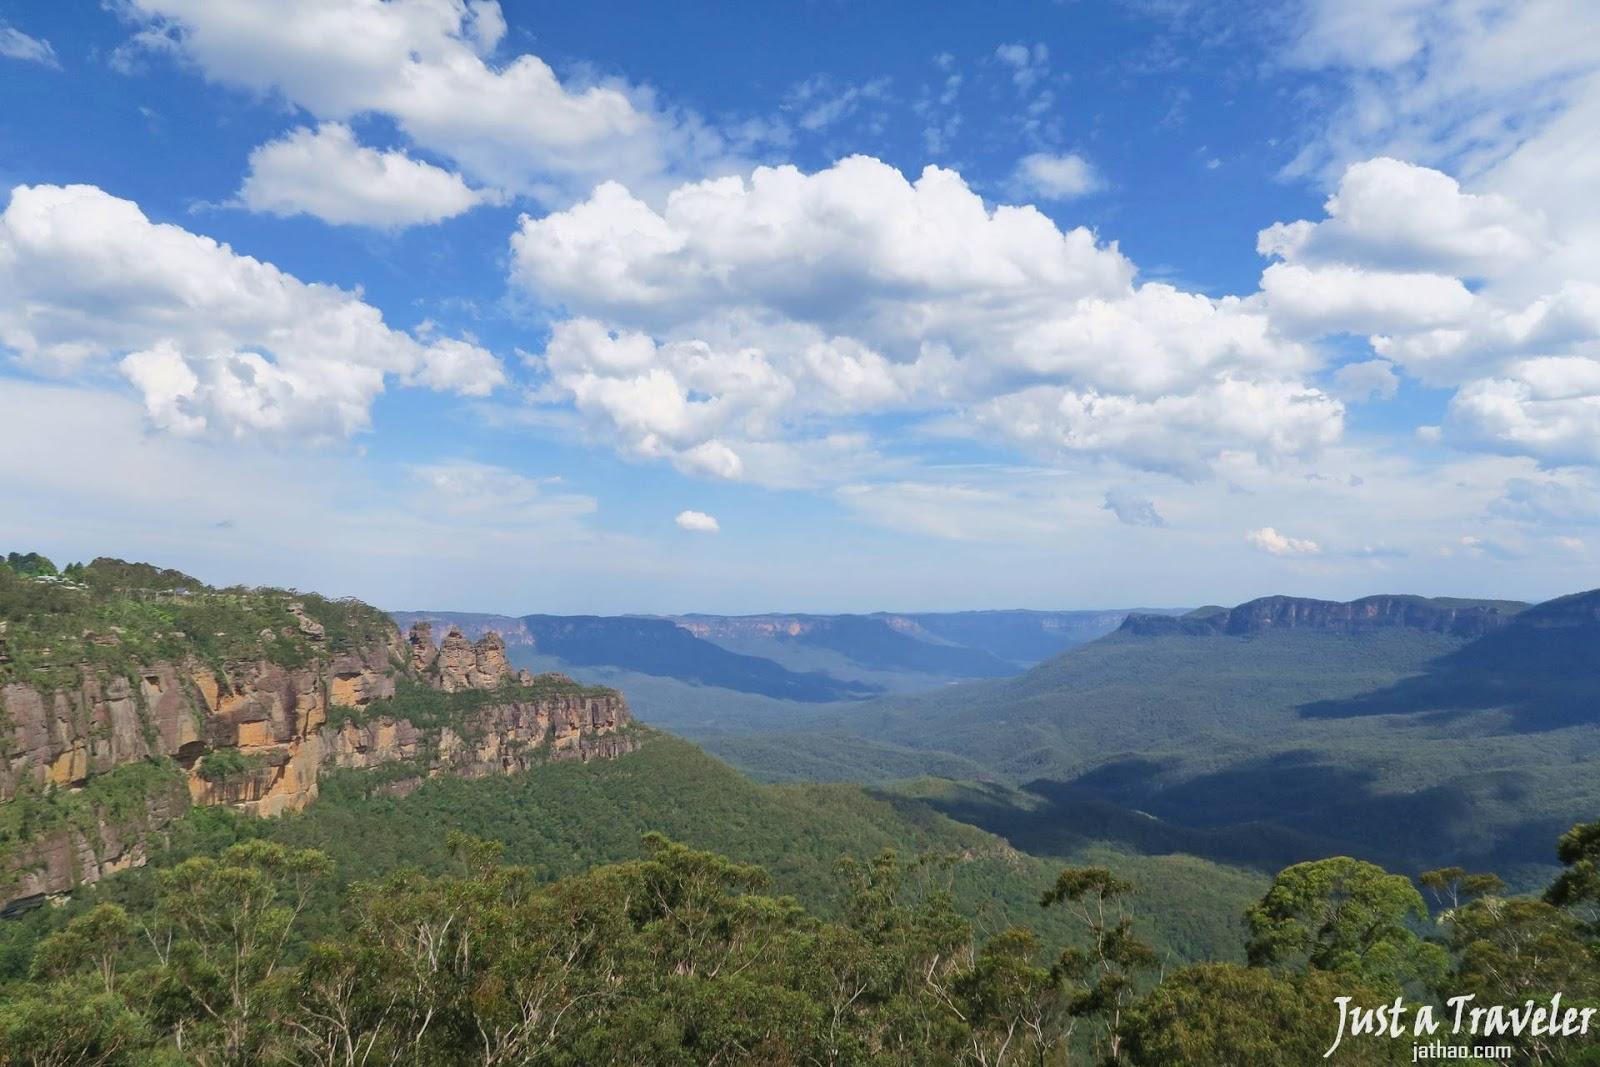 雪梨-景點-藍山-行程-交通-旅遊-自由行-澳洲-Sydney-Blue-Mountains-Tourist-Attraction-Travel-Australia